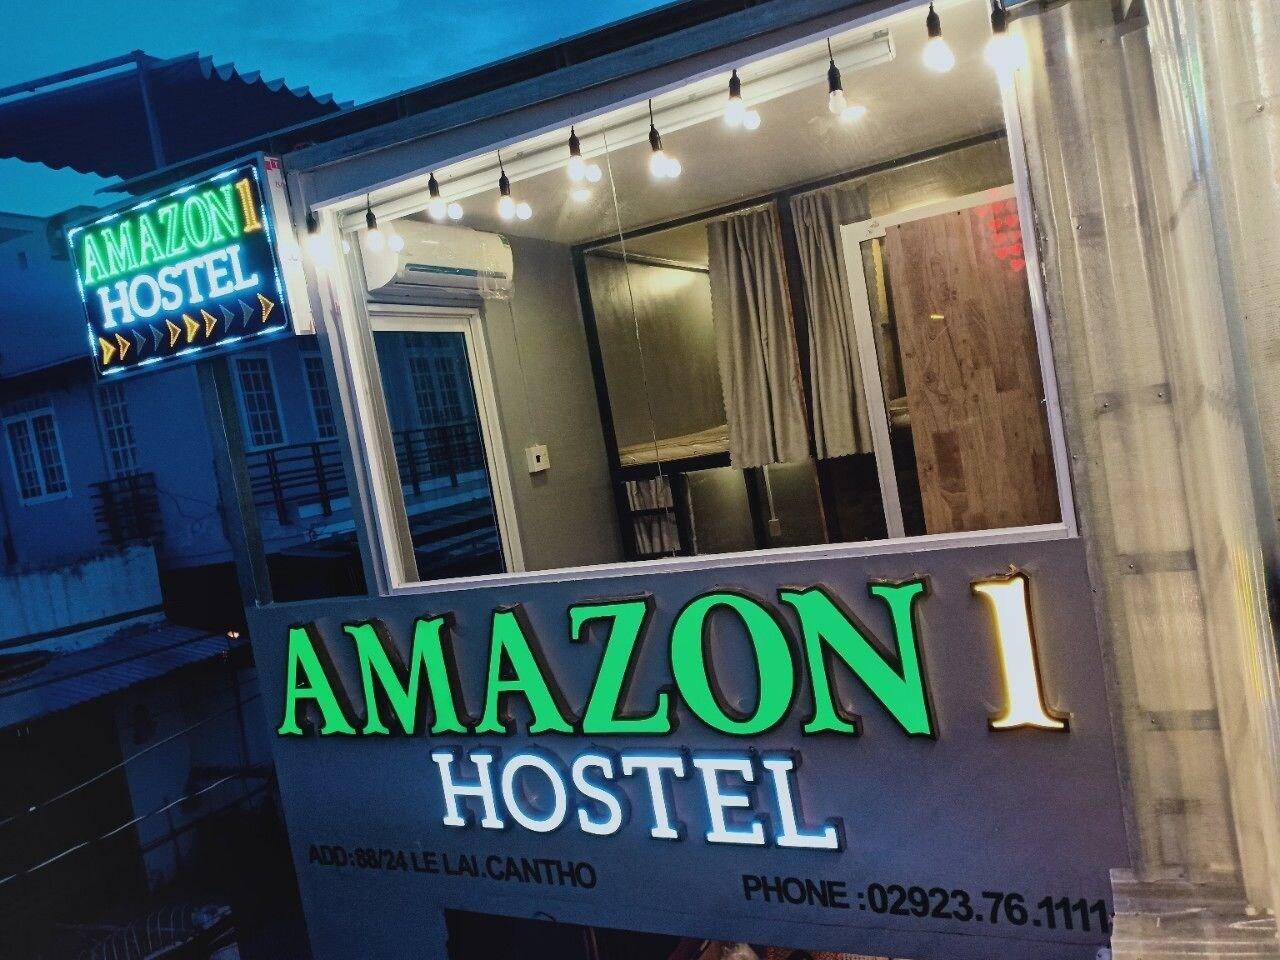 Amazon1 Hostel, Ninh Kiều